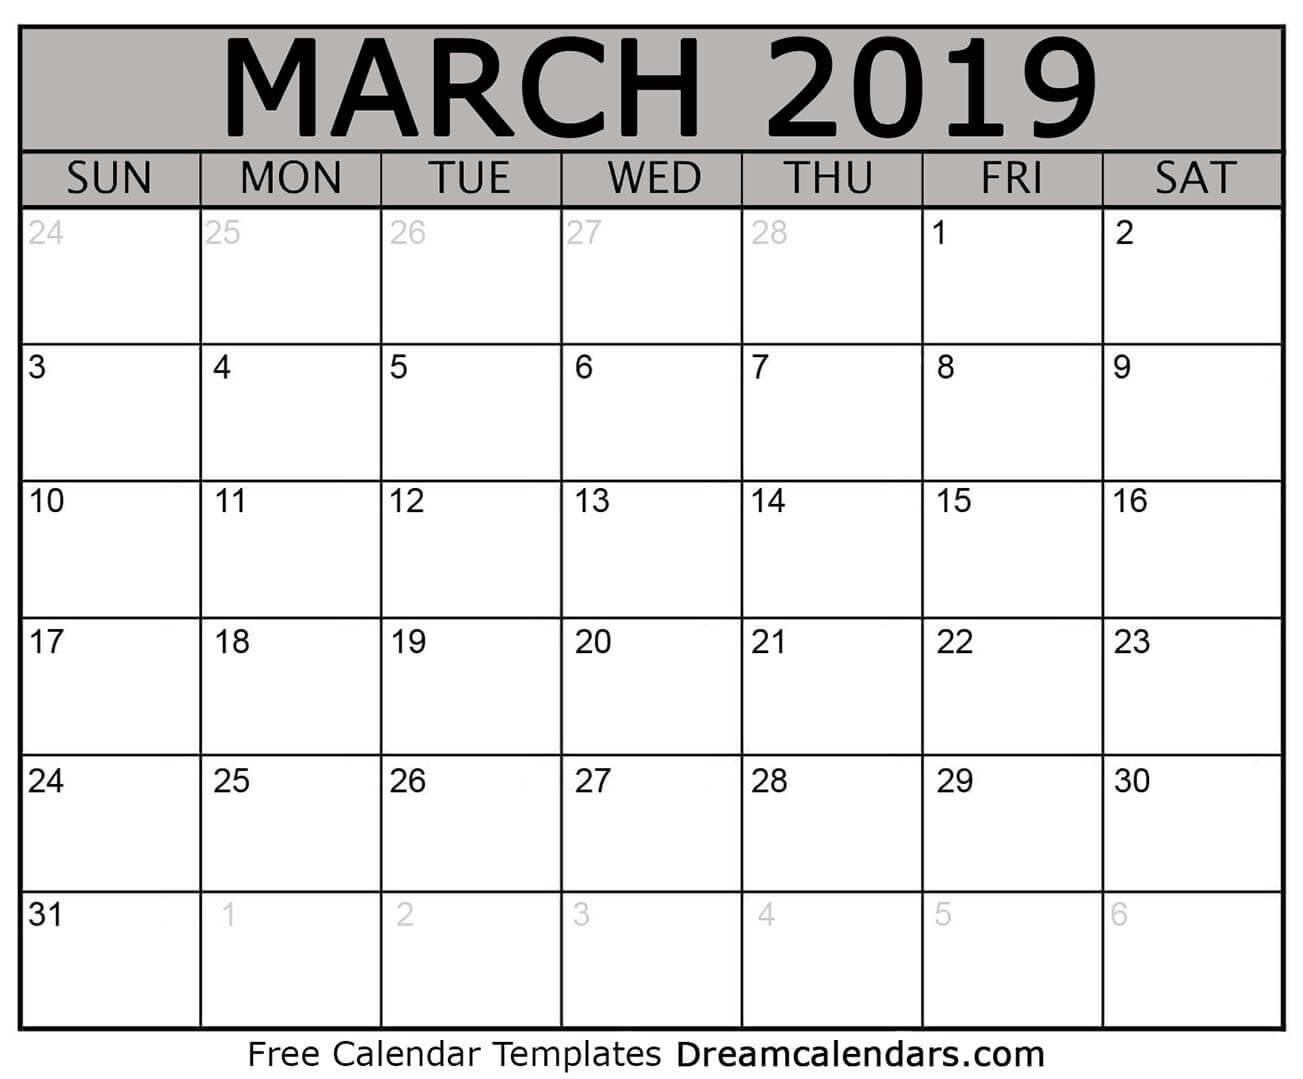 Short Timers Calendar Printable | Calendar Template 2020